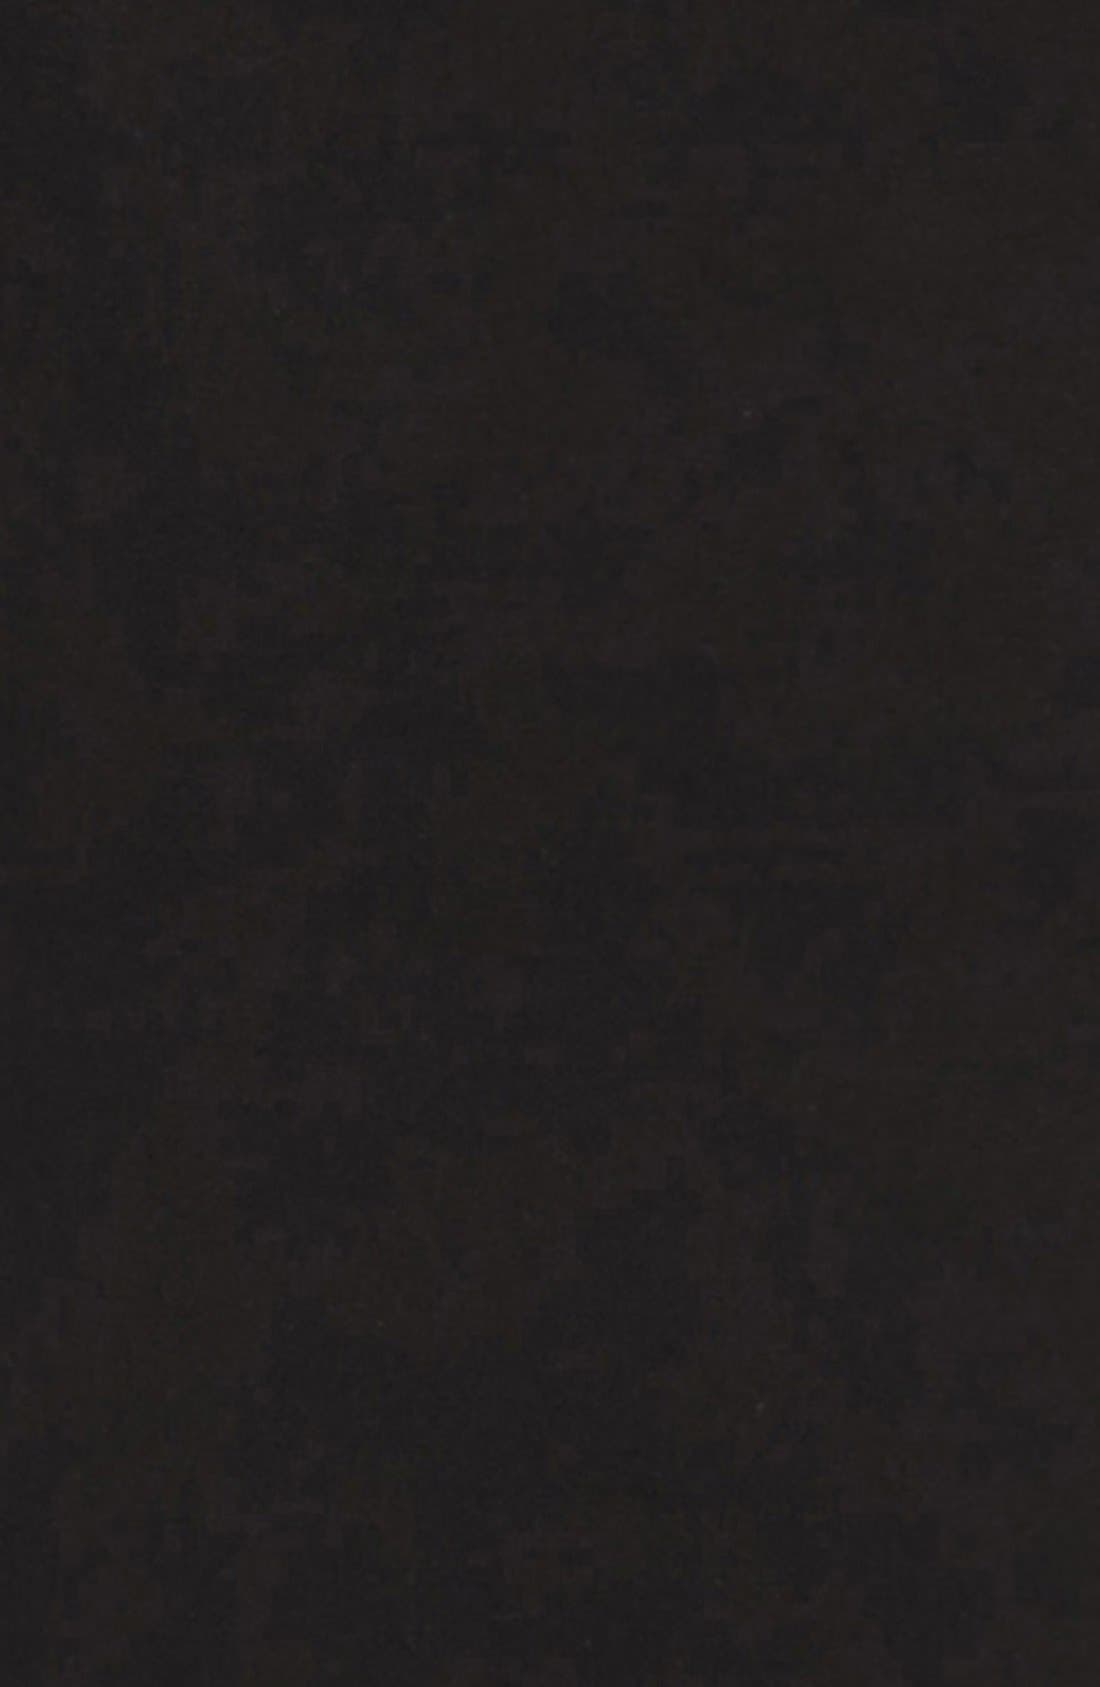 Faux Fur Lined Leggings,                             Alternate thumbnail 2, color,                             001